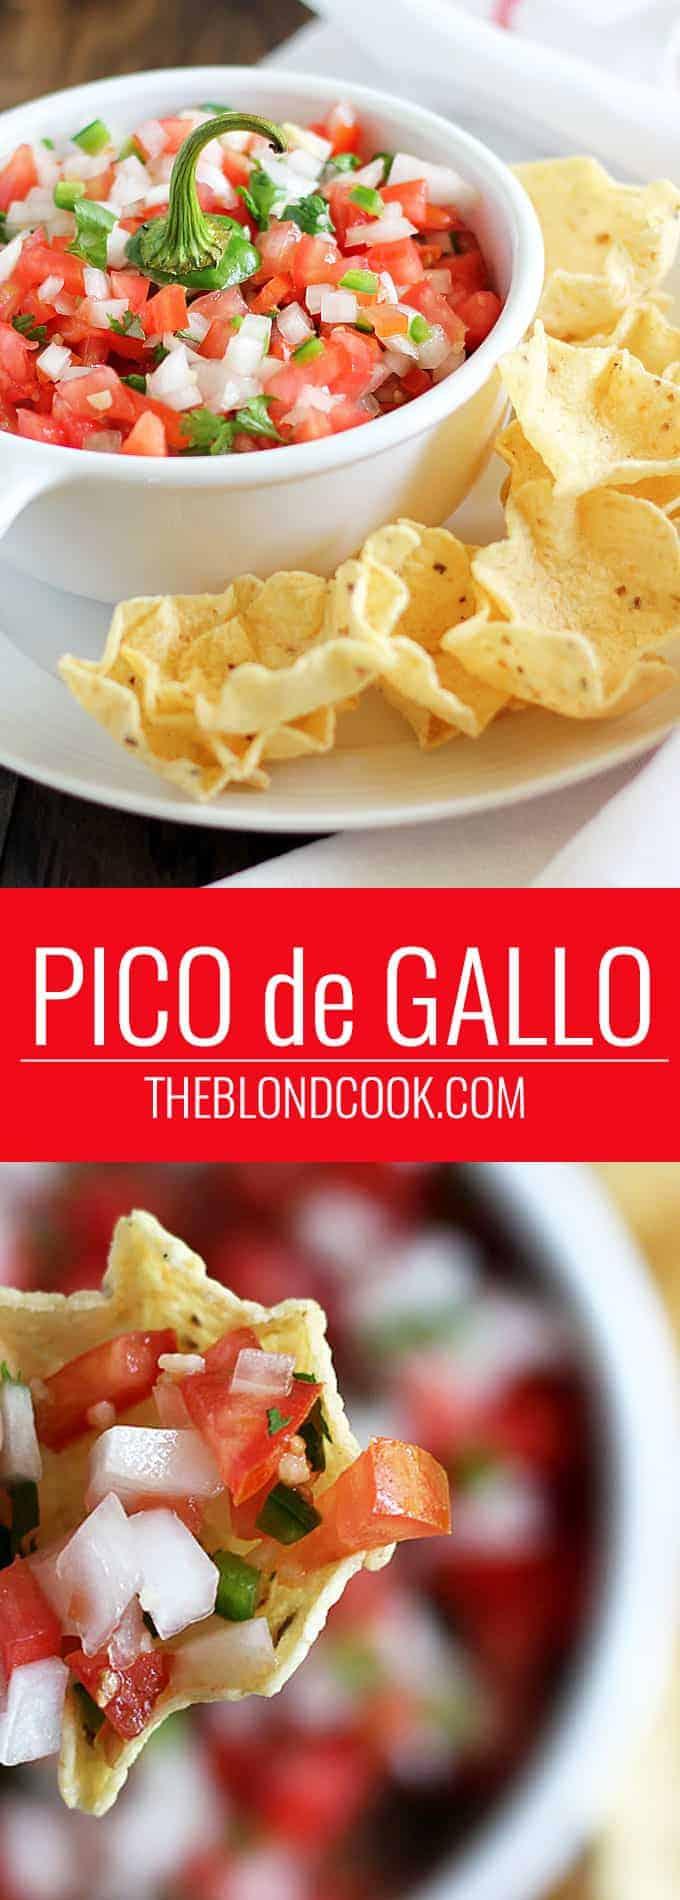 Pico de Gallo -- A healthy, and delicious salsa loaded with healthy veggies!